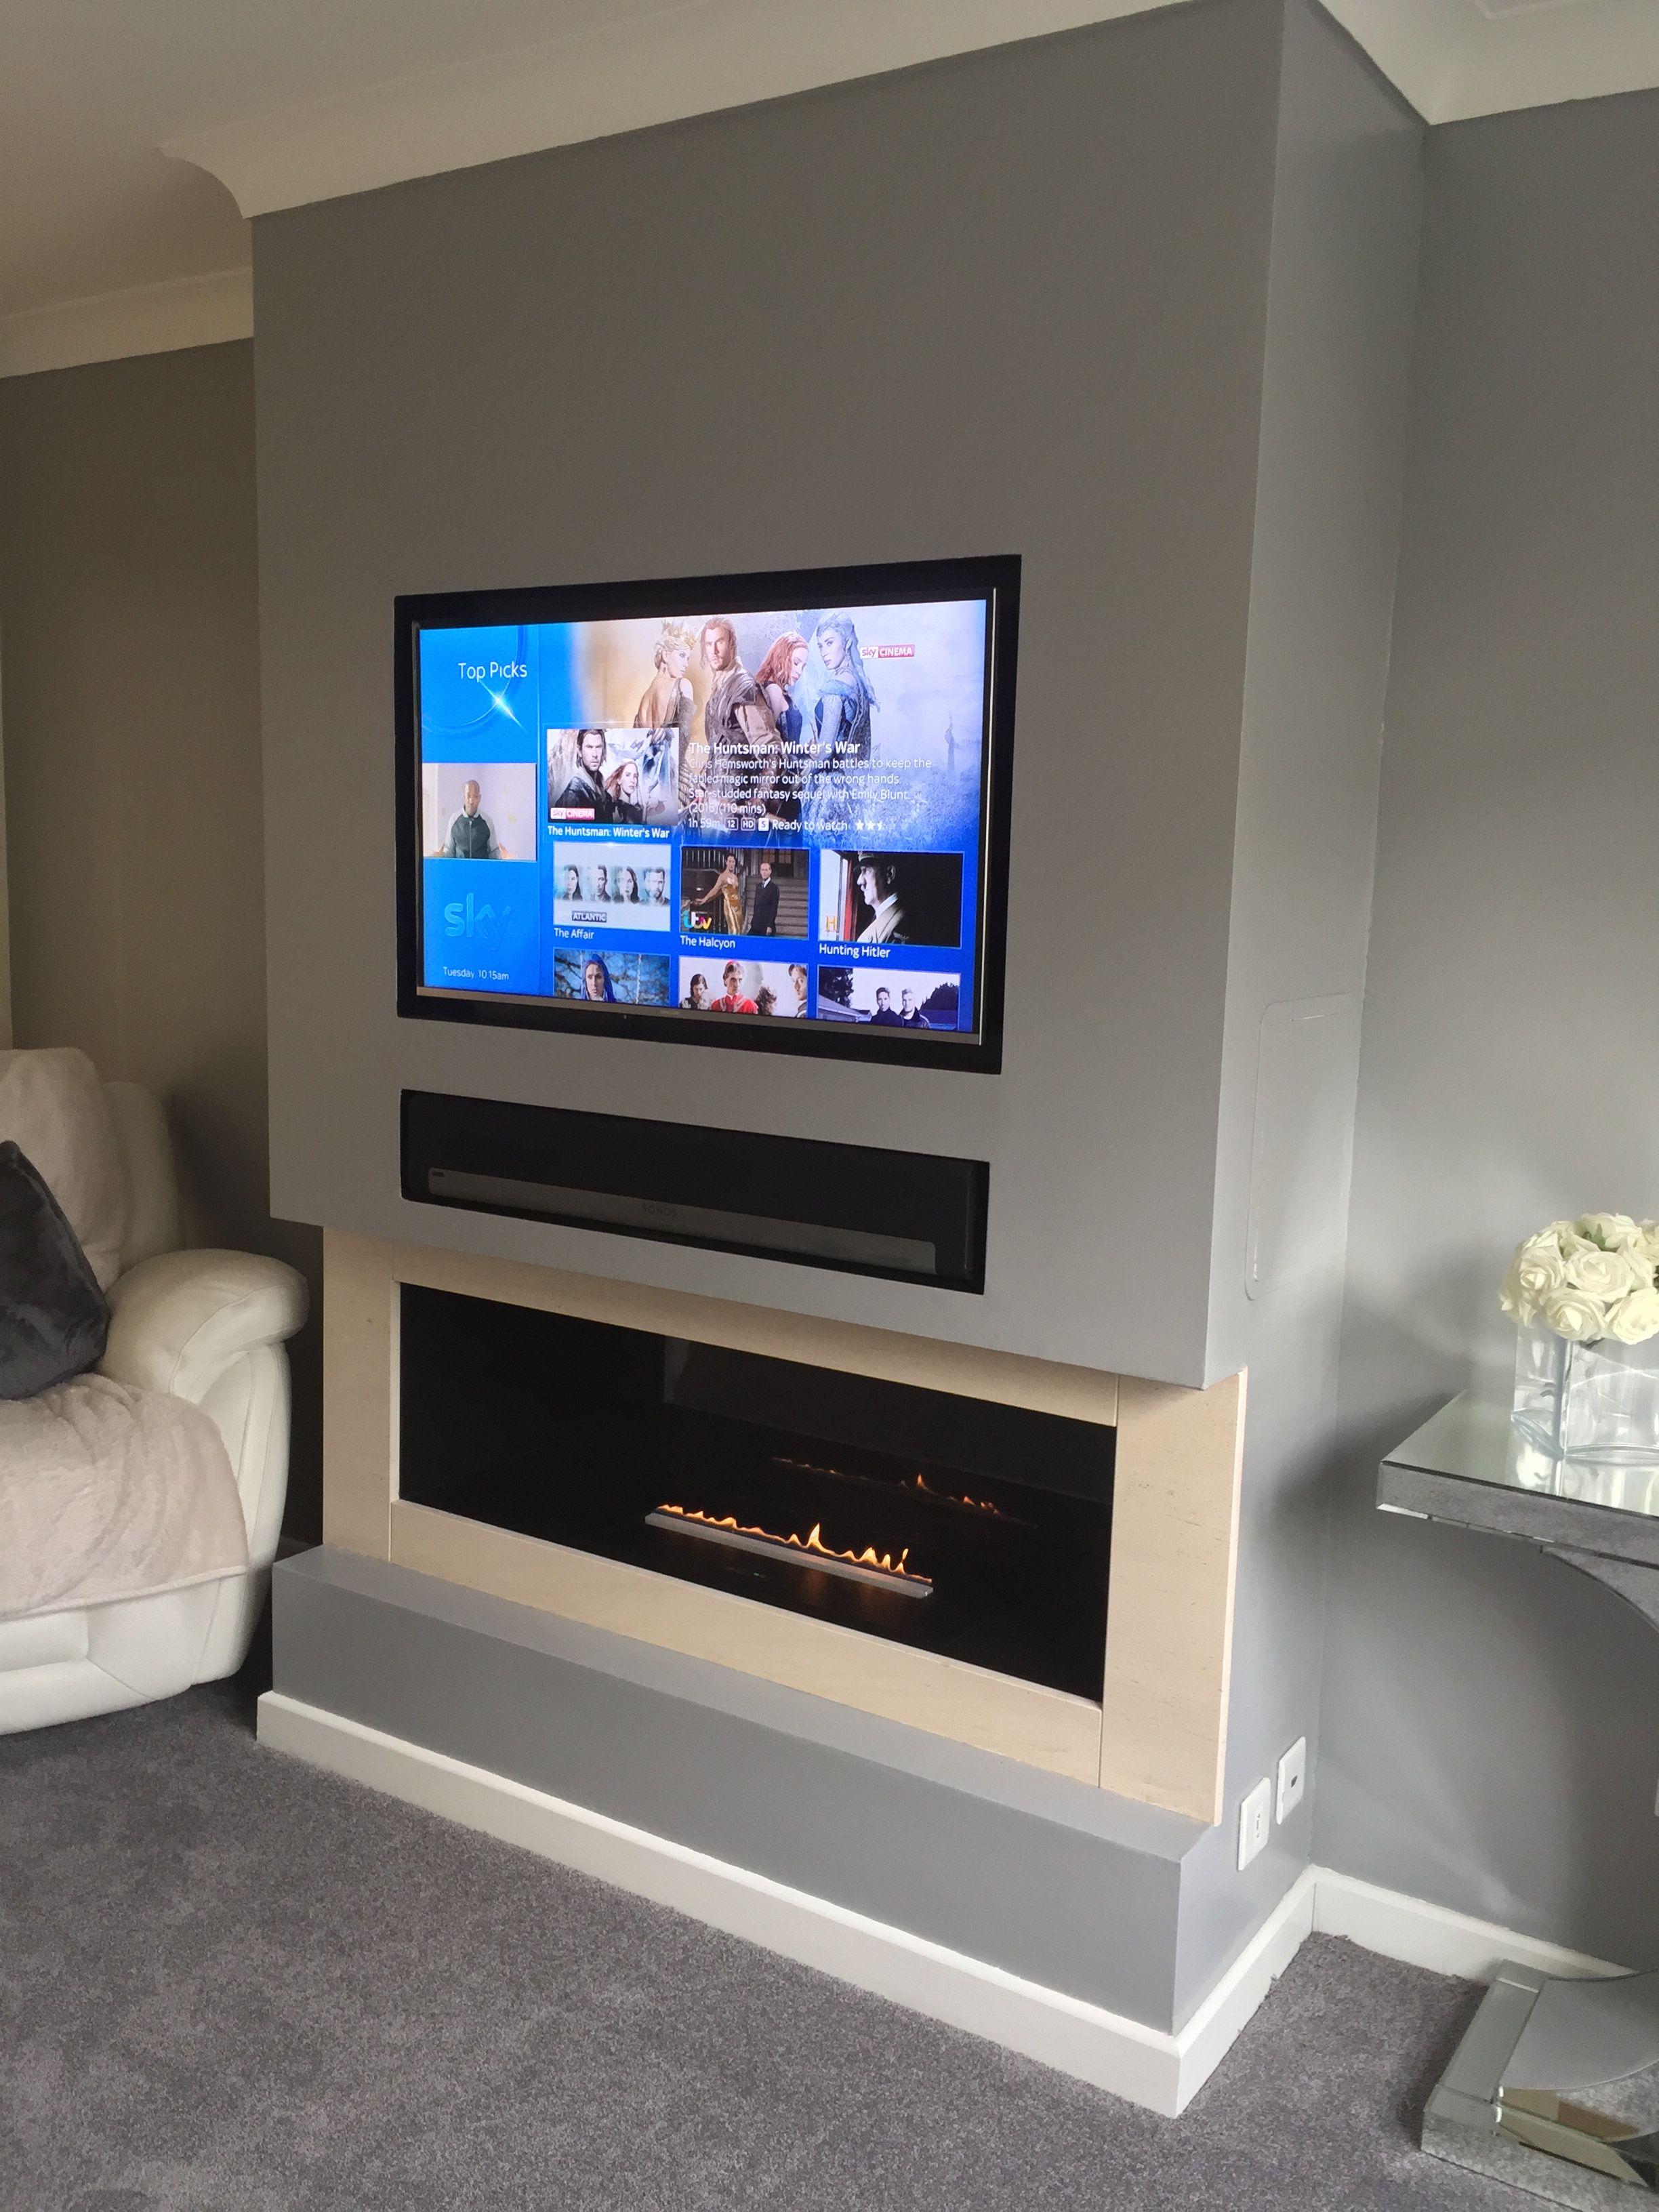 Pin By Nacho Figueroa On Tv Above Fireplace Fireplace Tv Wall Living Room Decor Fireplace Home Fireplace